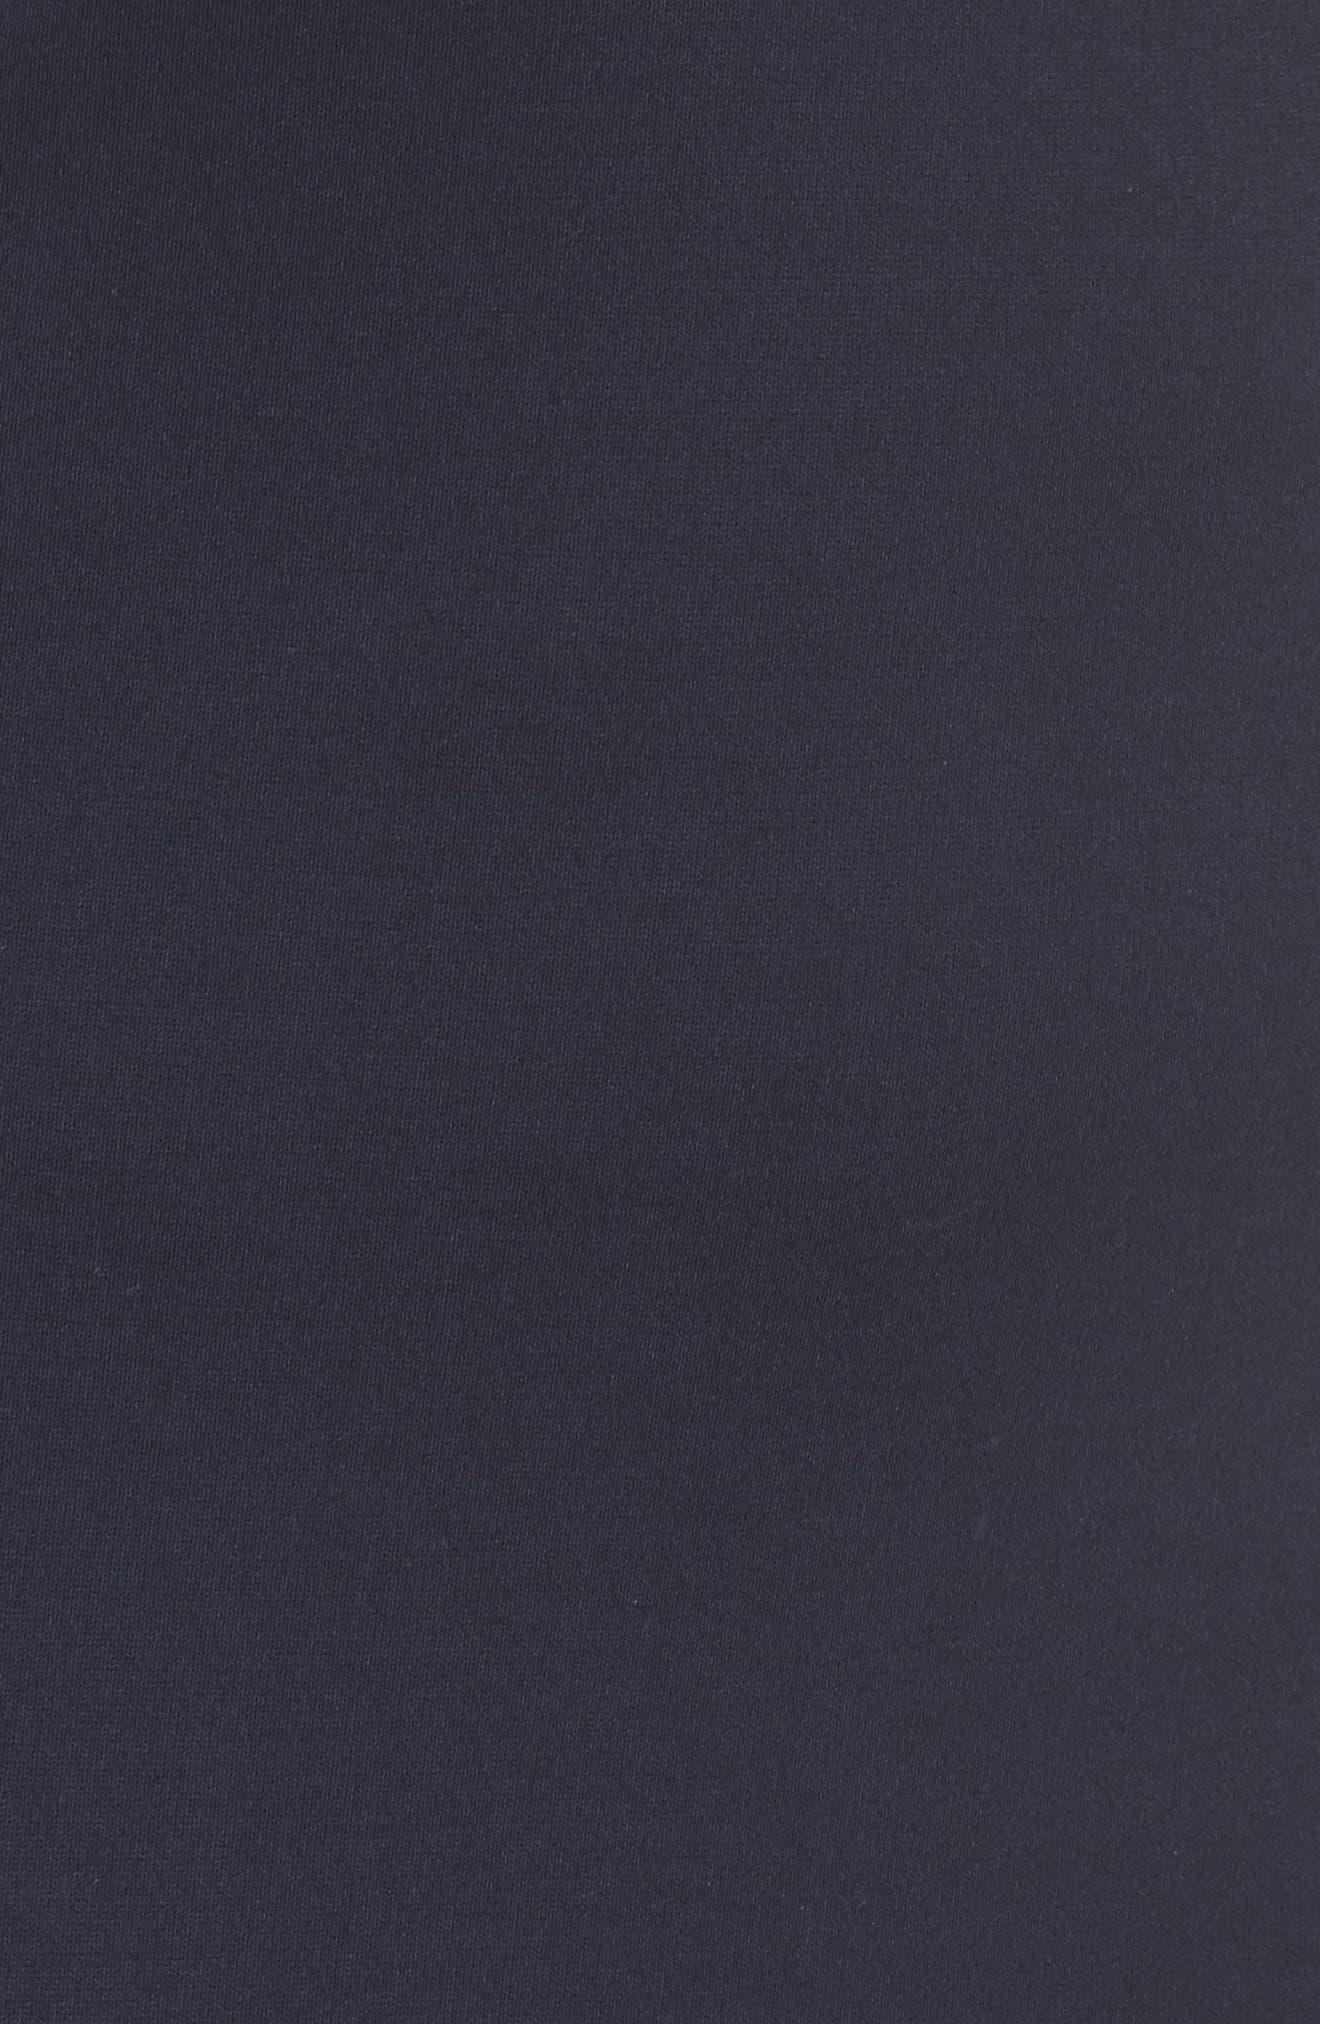 Ruffle Hem Sheath Dress,                             Alternate thumbnail 5, color,                             Navy Sapphire